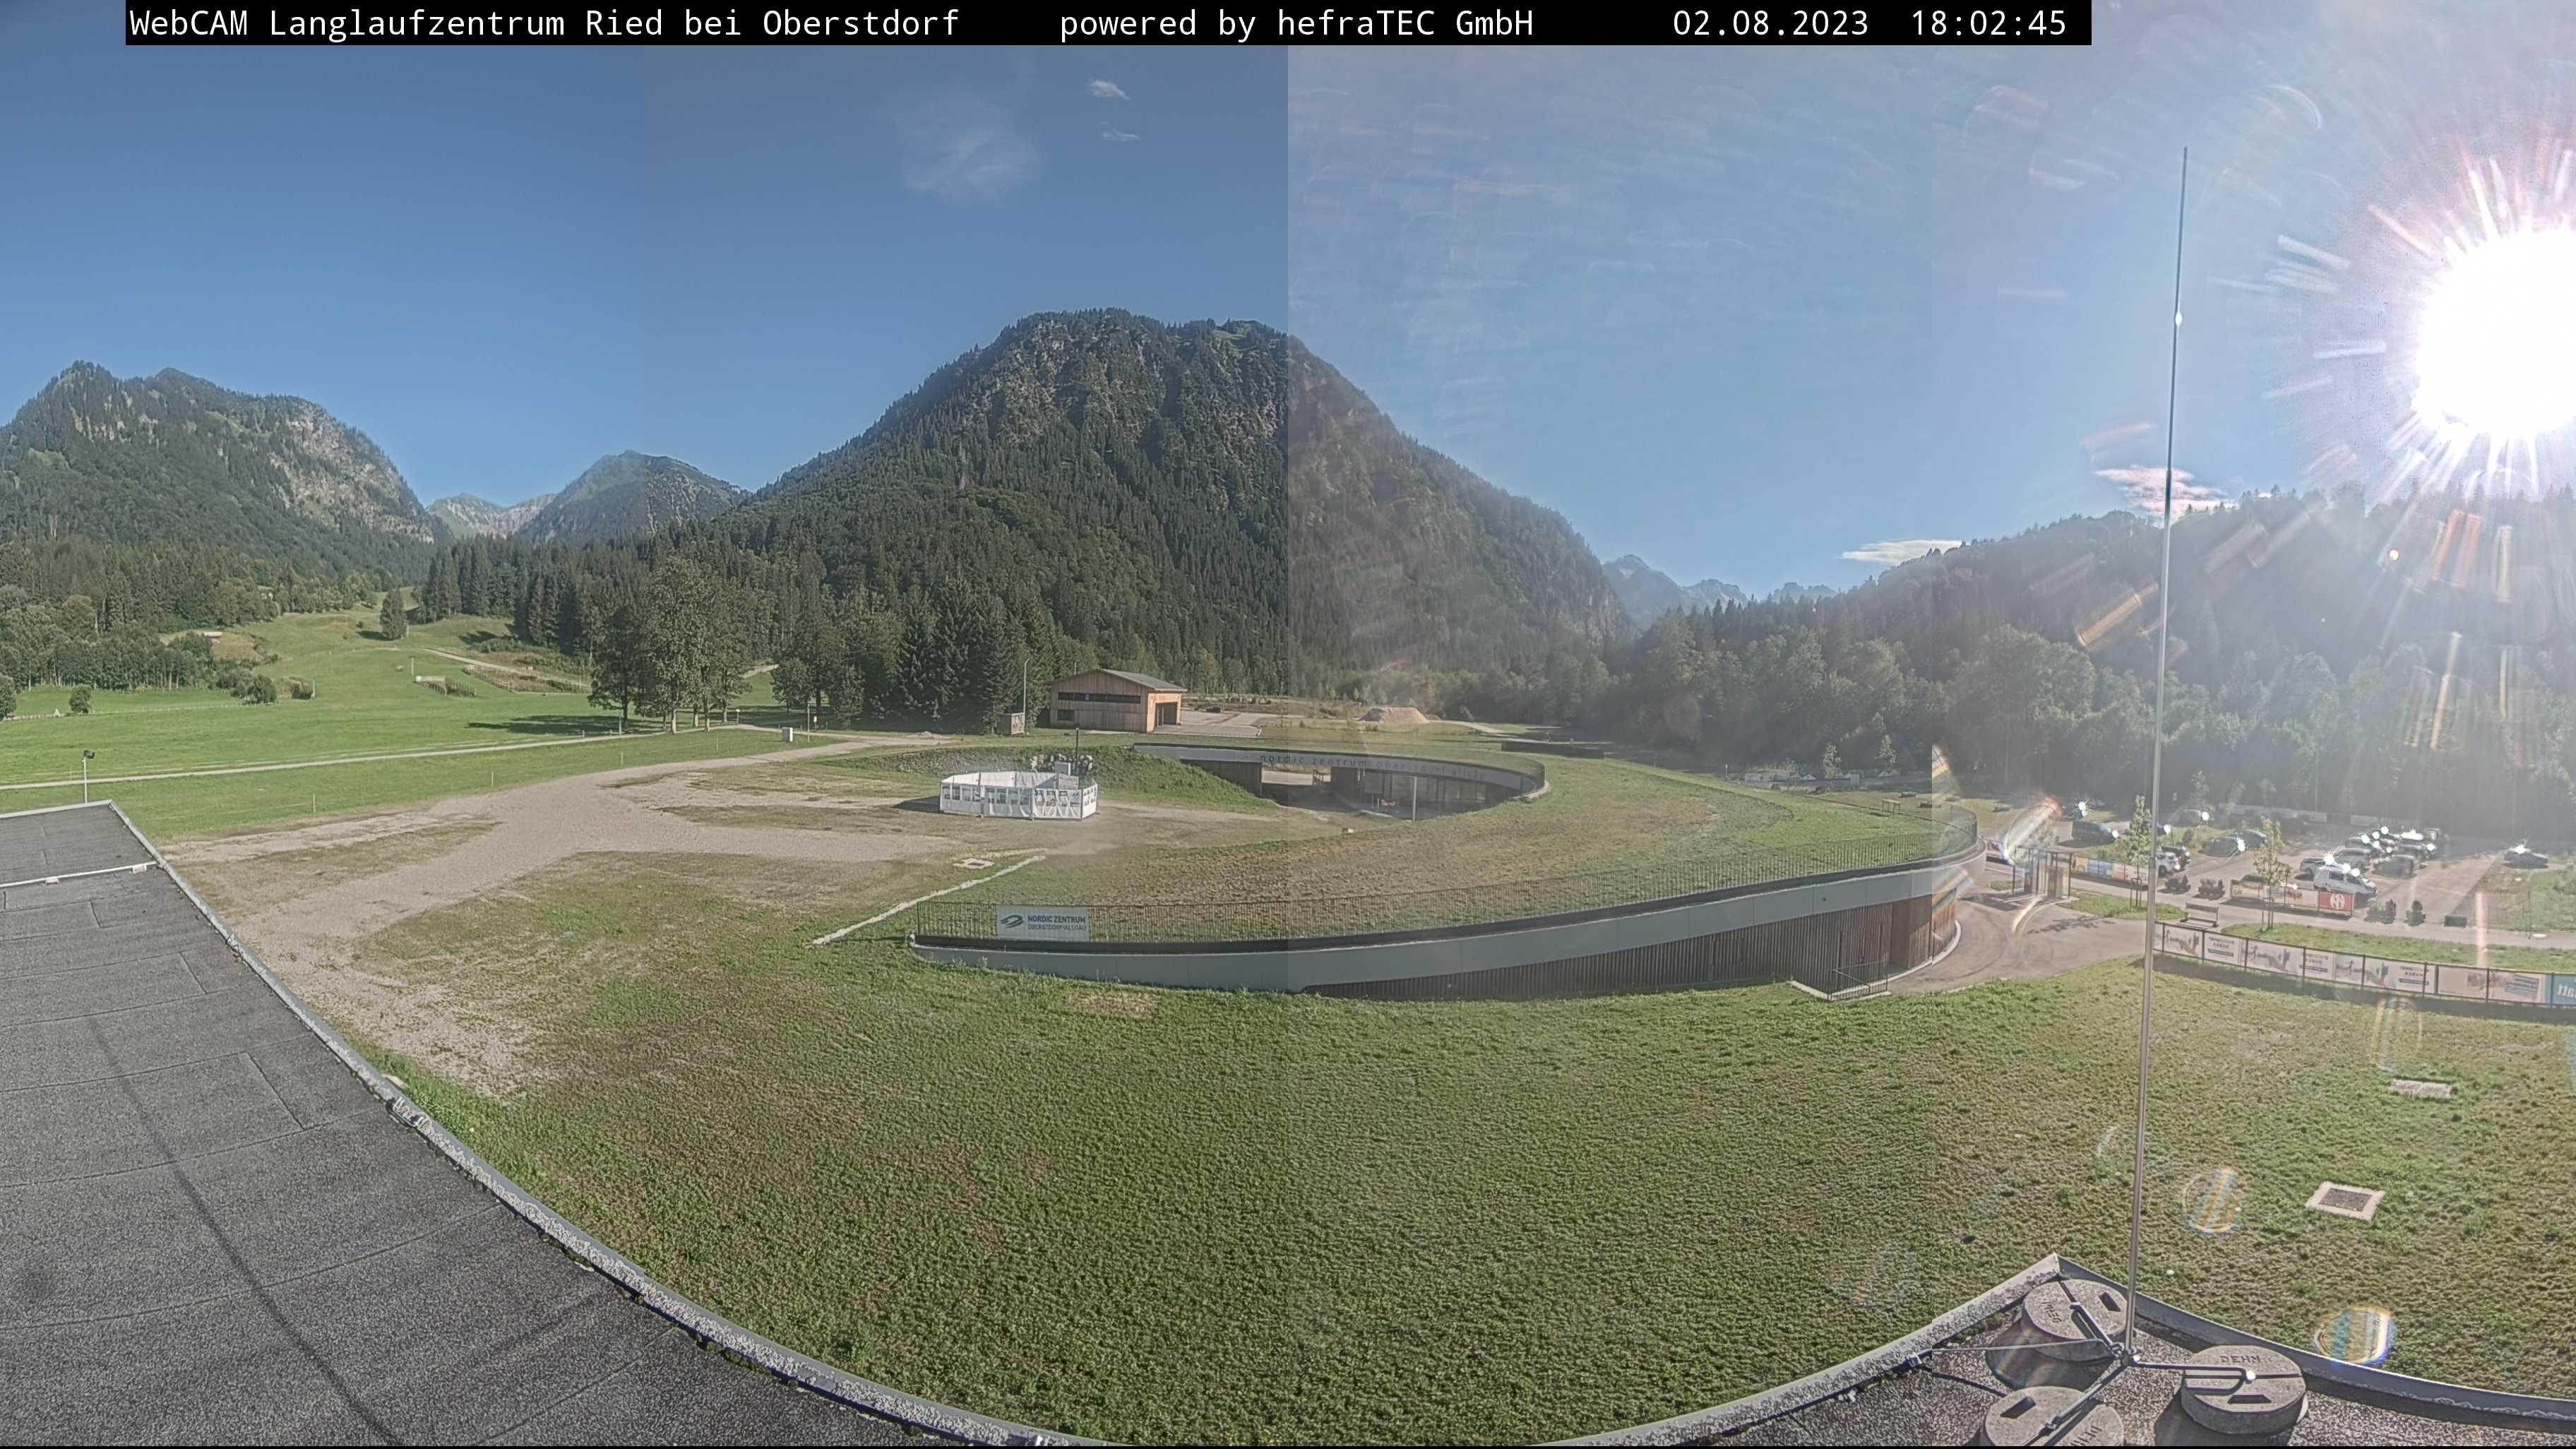 Webcam: Langlaufstadion Ried